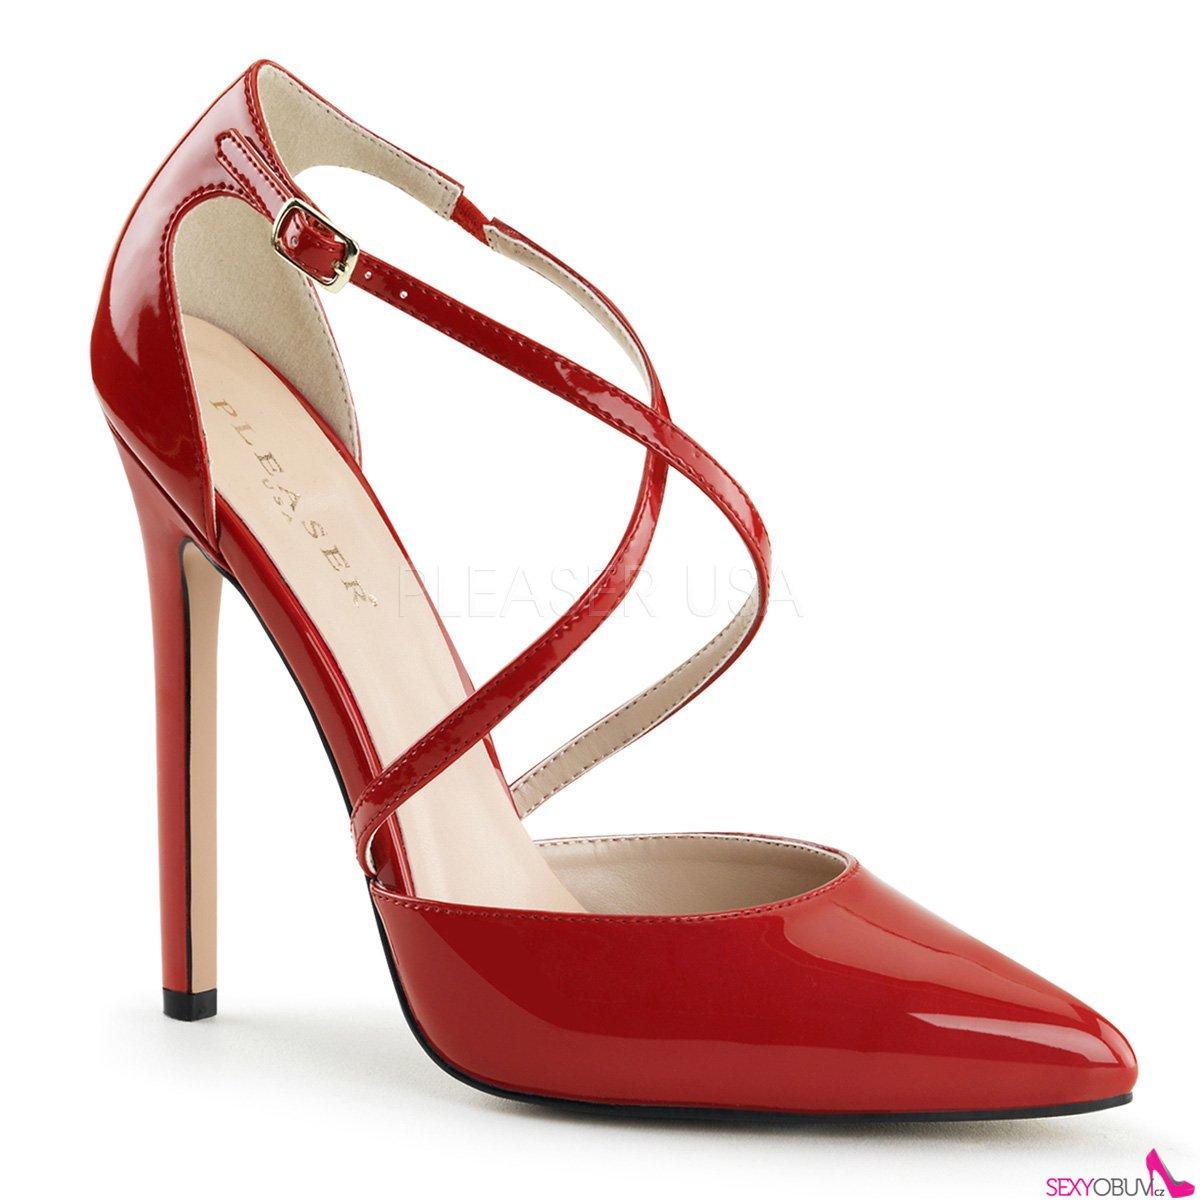 c753131696bd SEXY-26 Červené sexy lodičky na podpatku